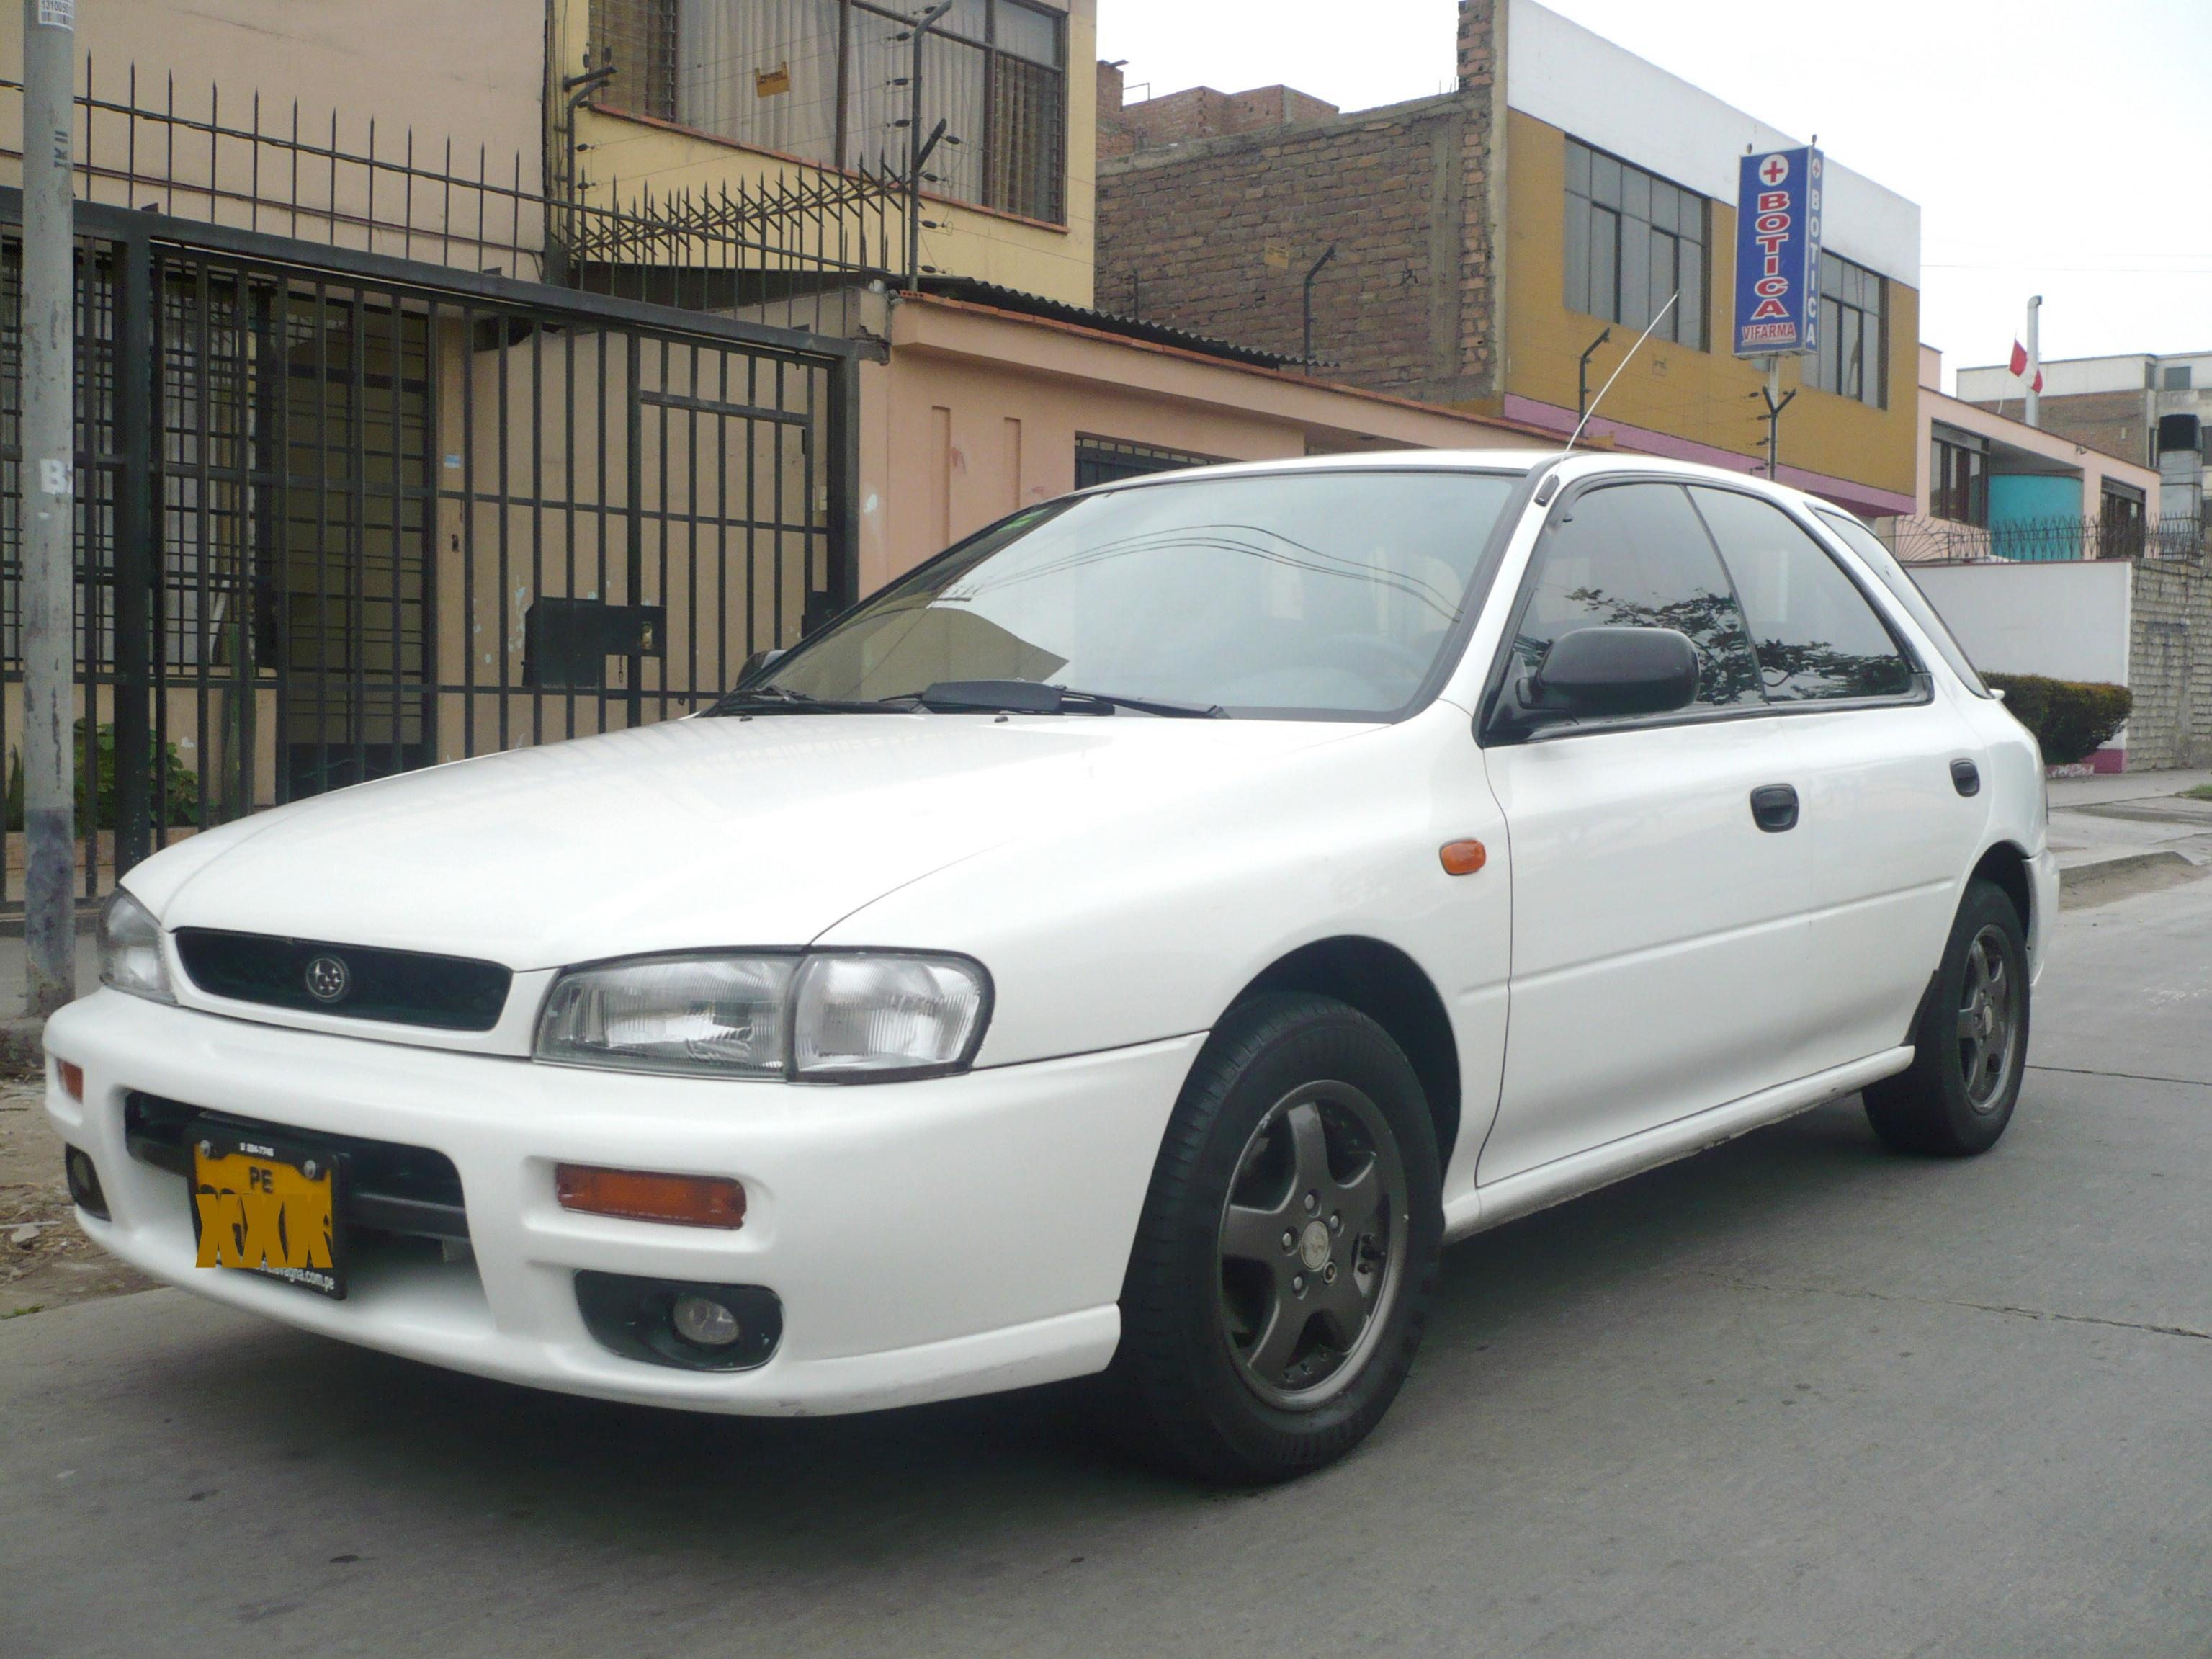 Subaru Impreza Sw Picture 4 Reviews News Specs Buy Car